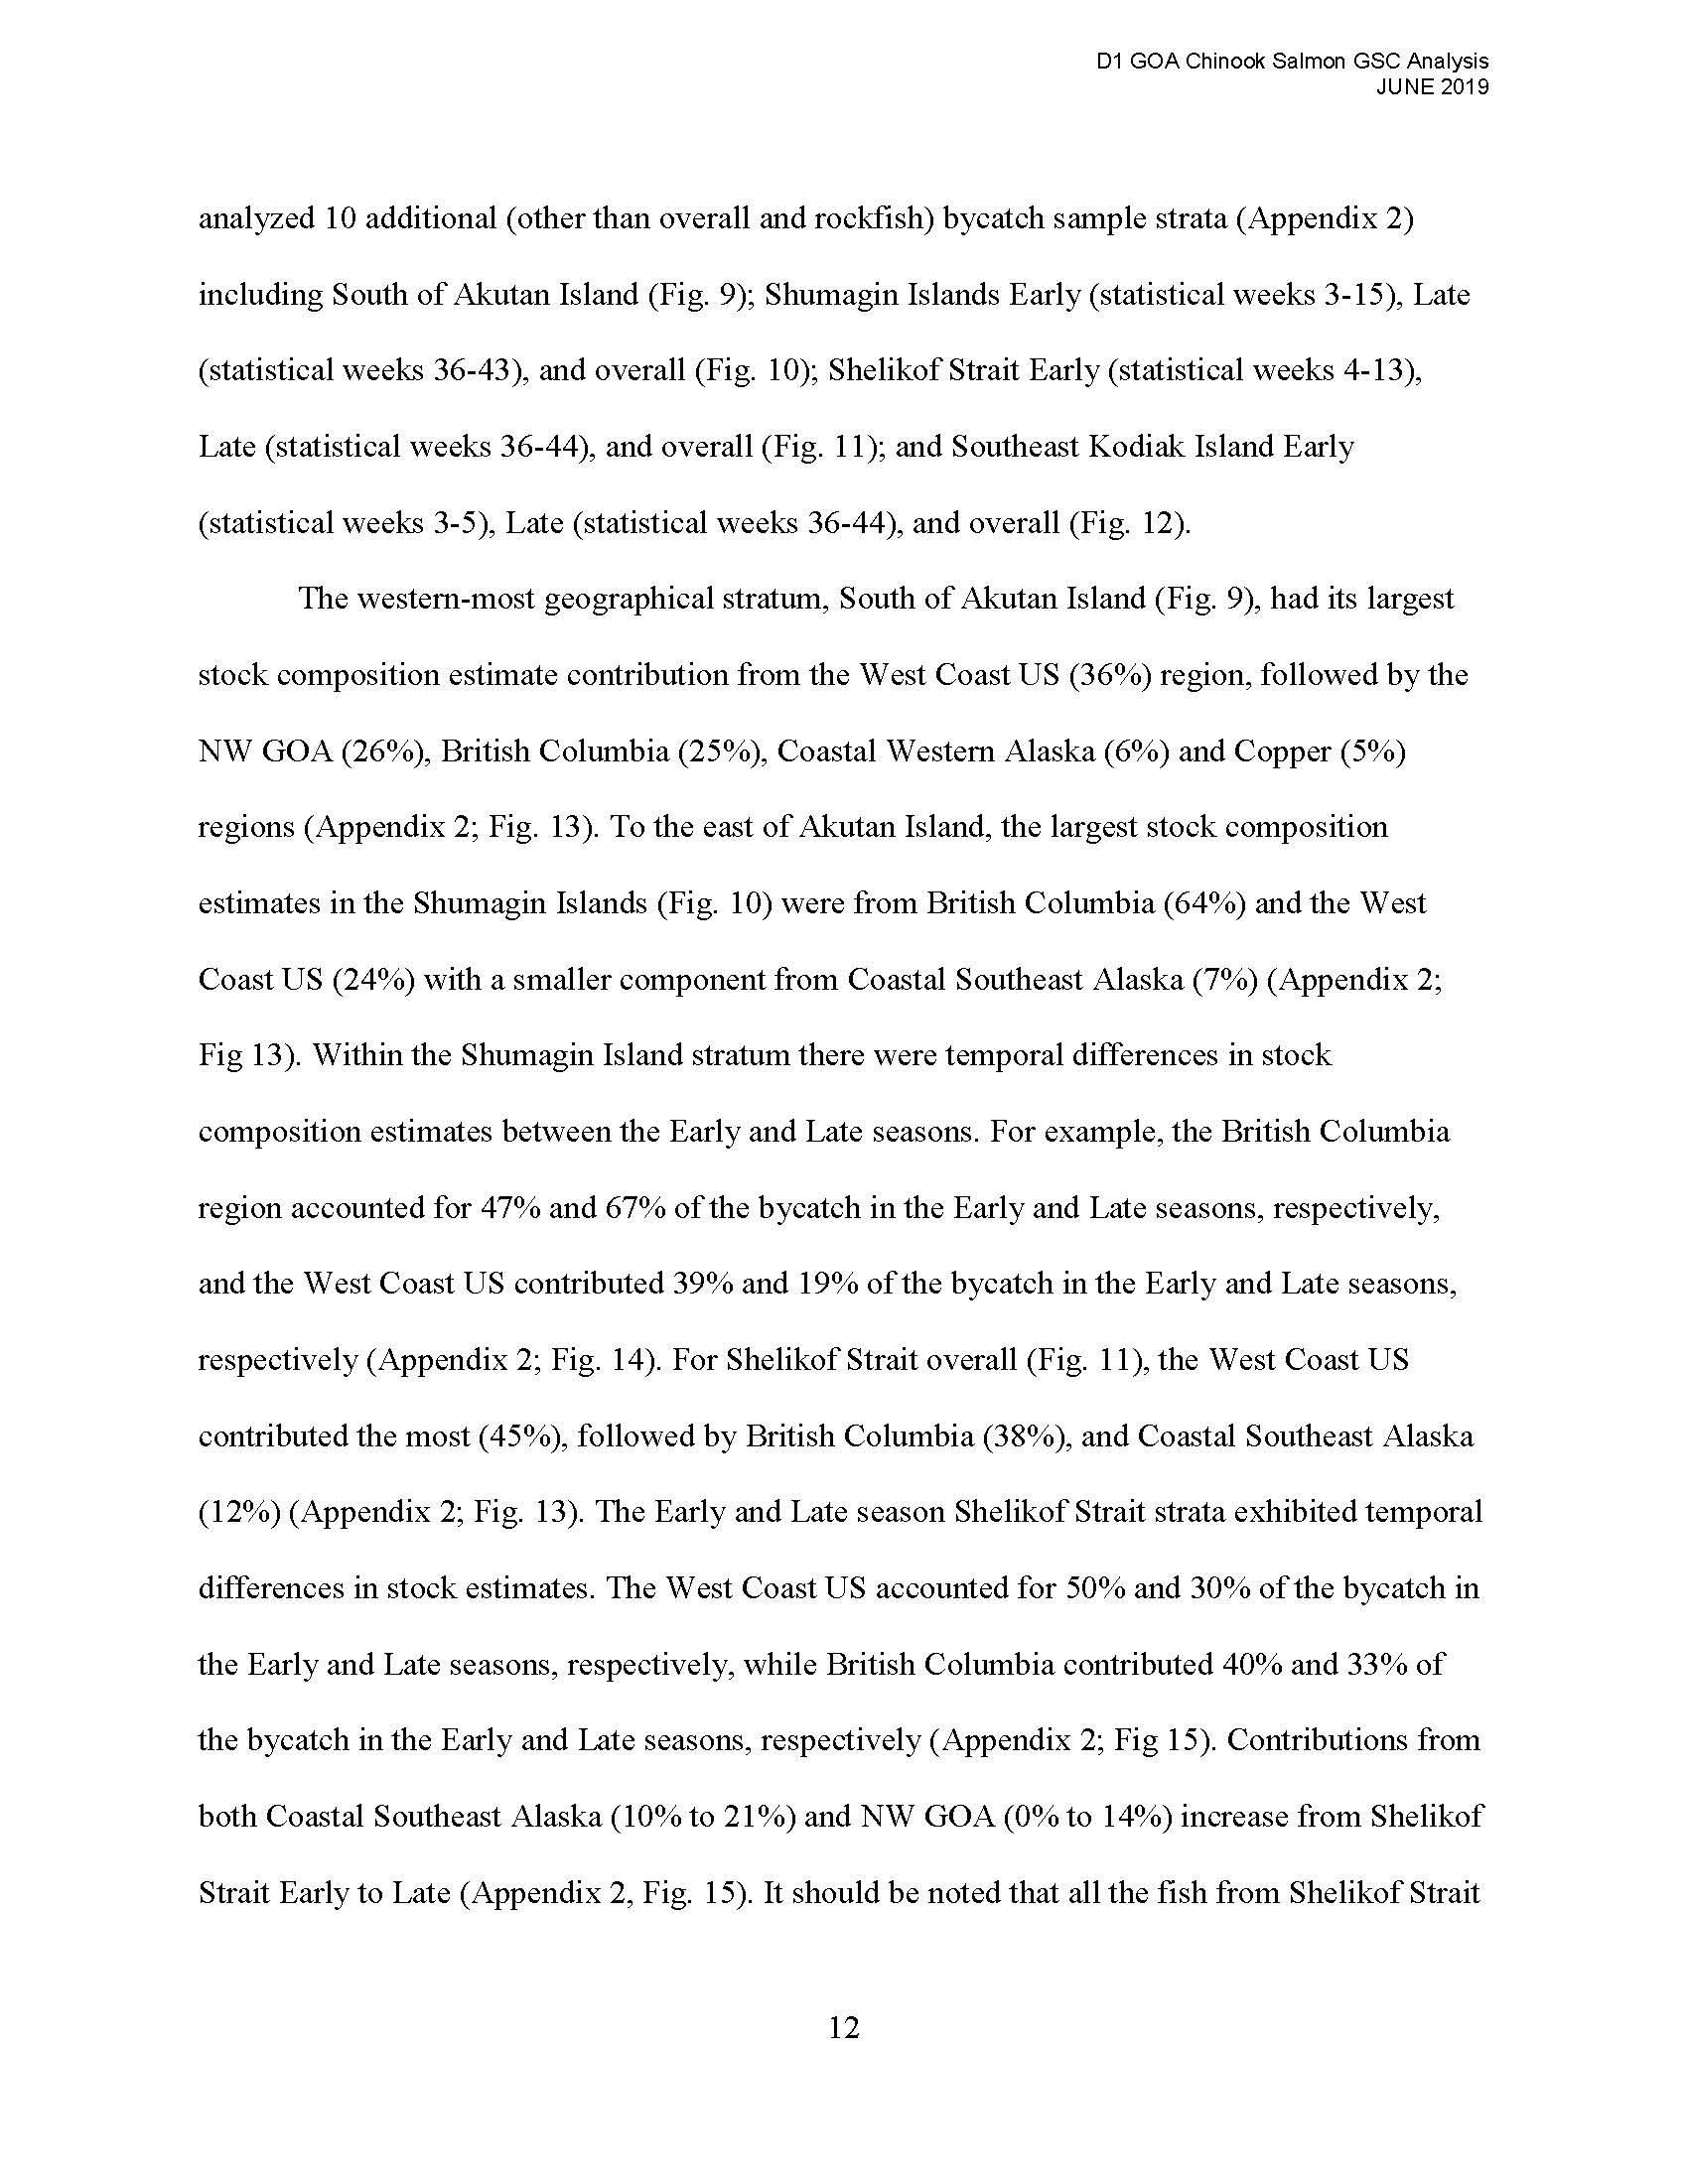 DownloadFile  GOA Chinook Salmon Stock Composition Report.pdf_Page_20.jpg